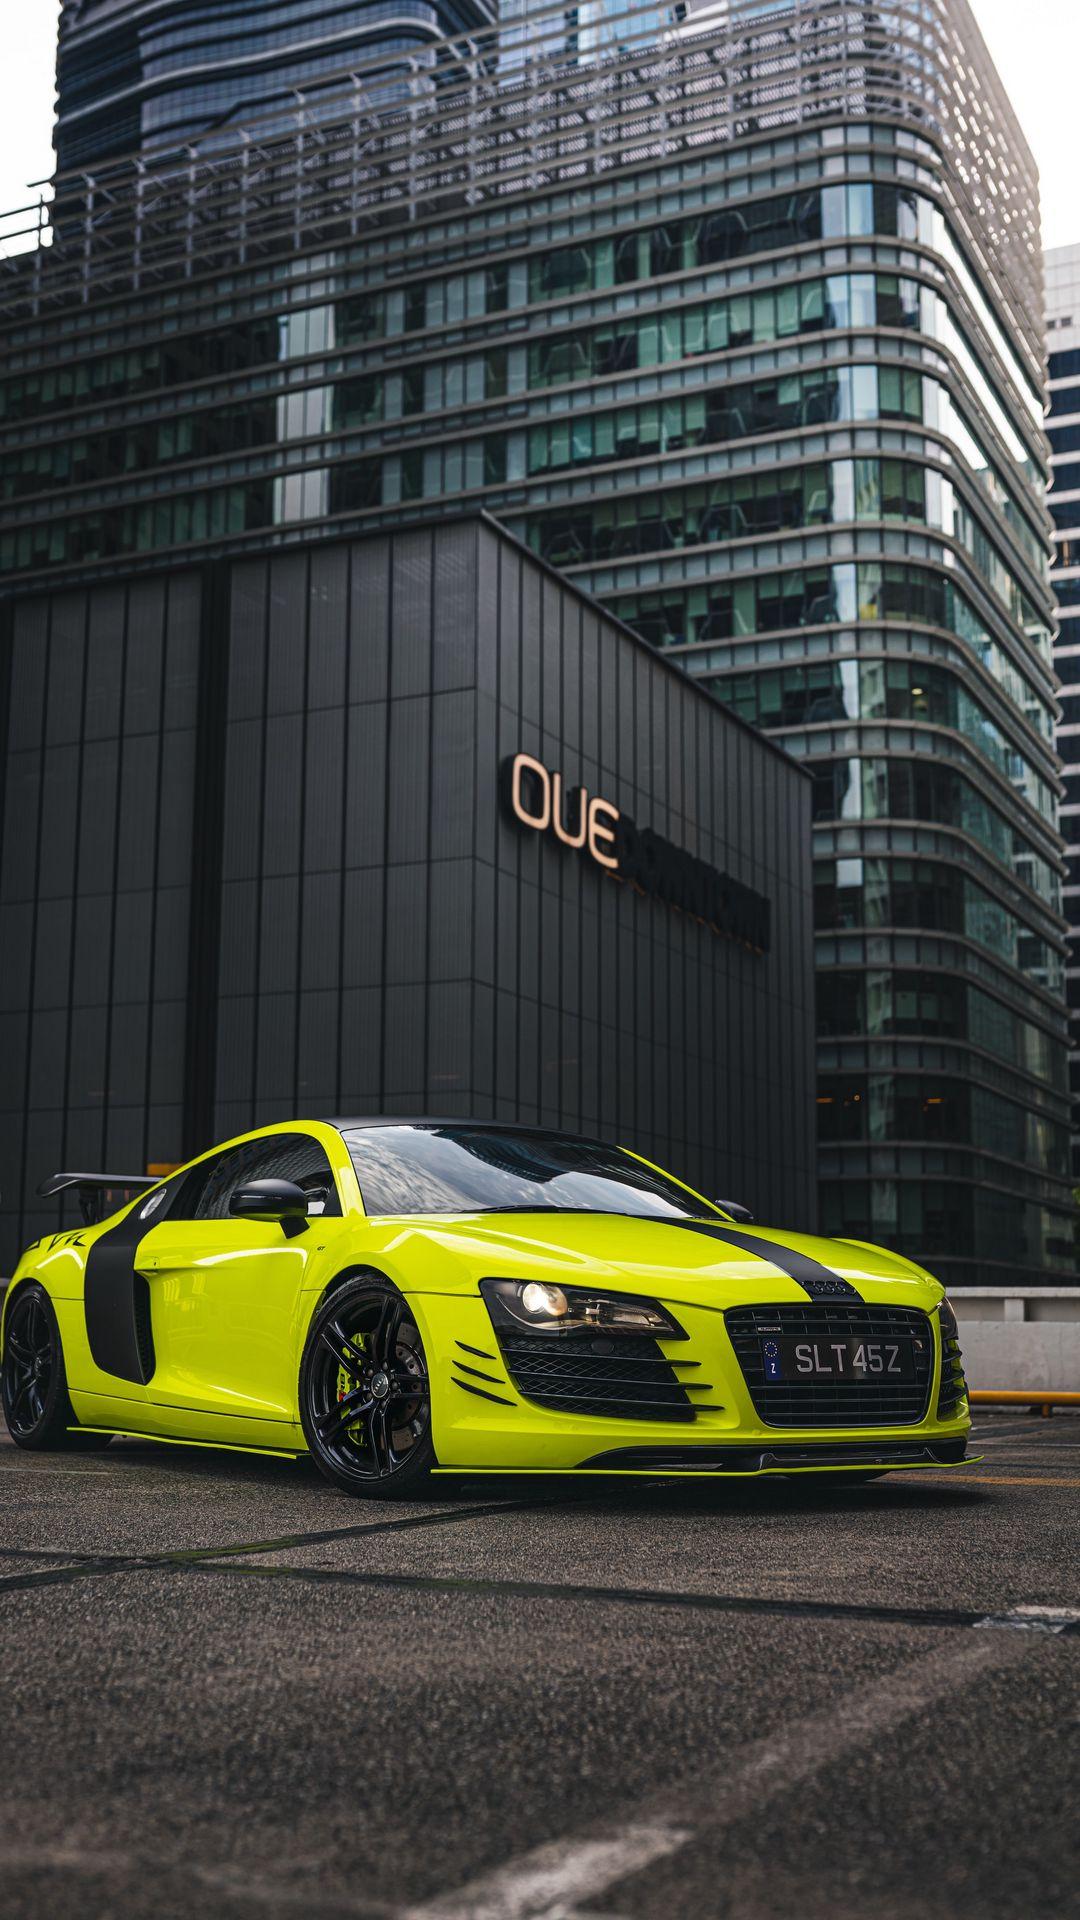 Audi R8 HD Wallpapers Free Download